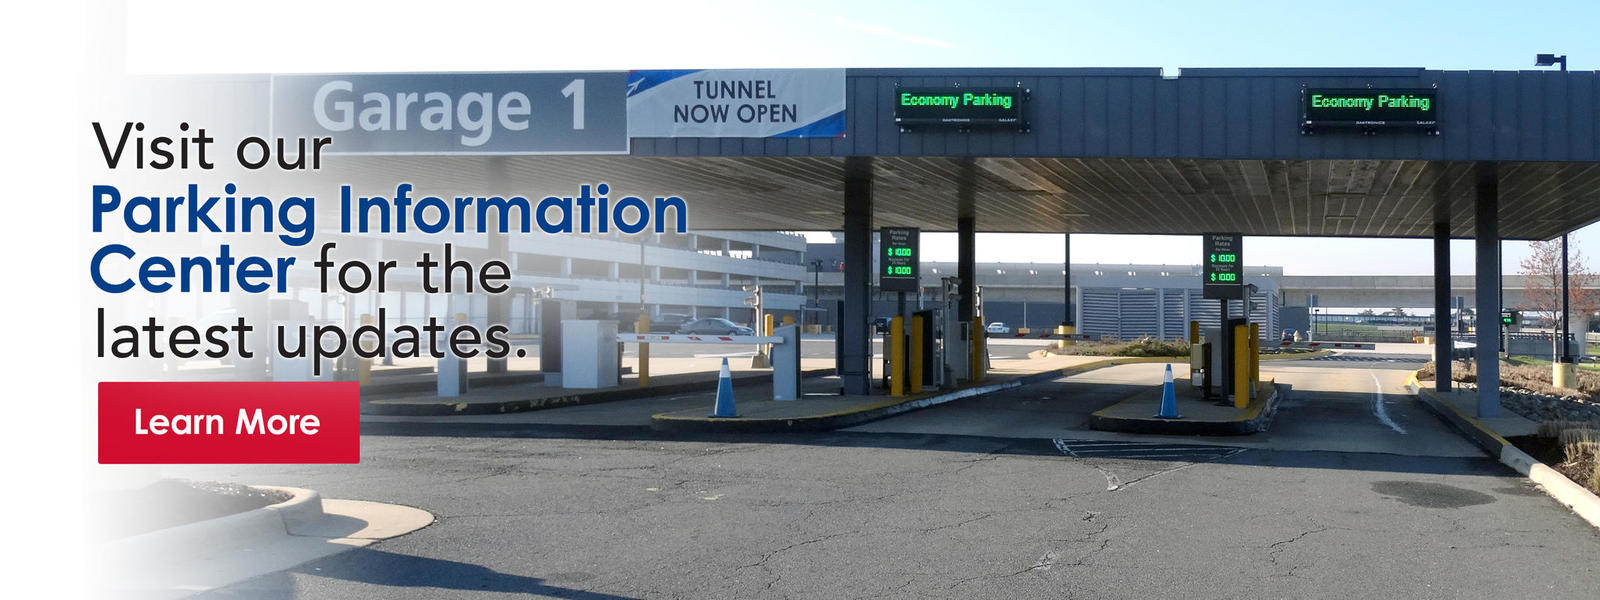 Parking Information Center